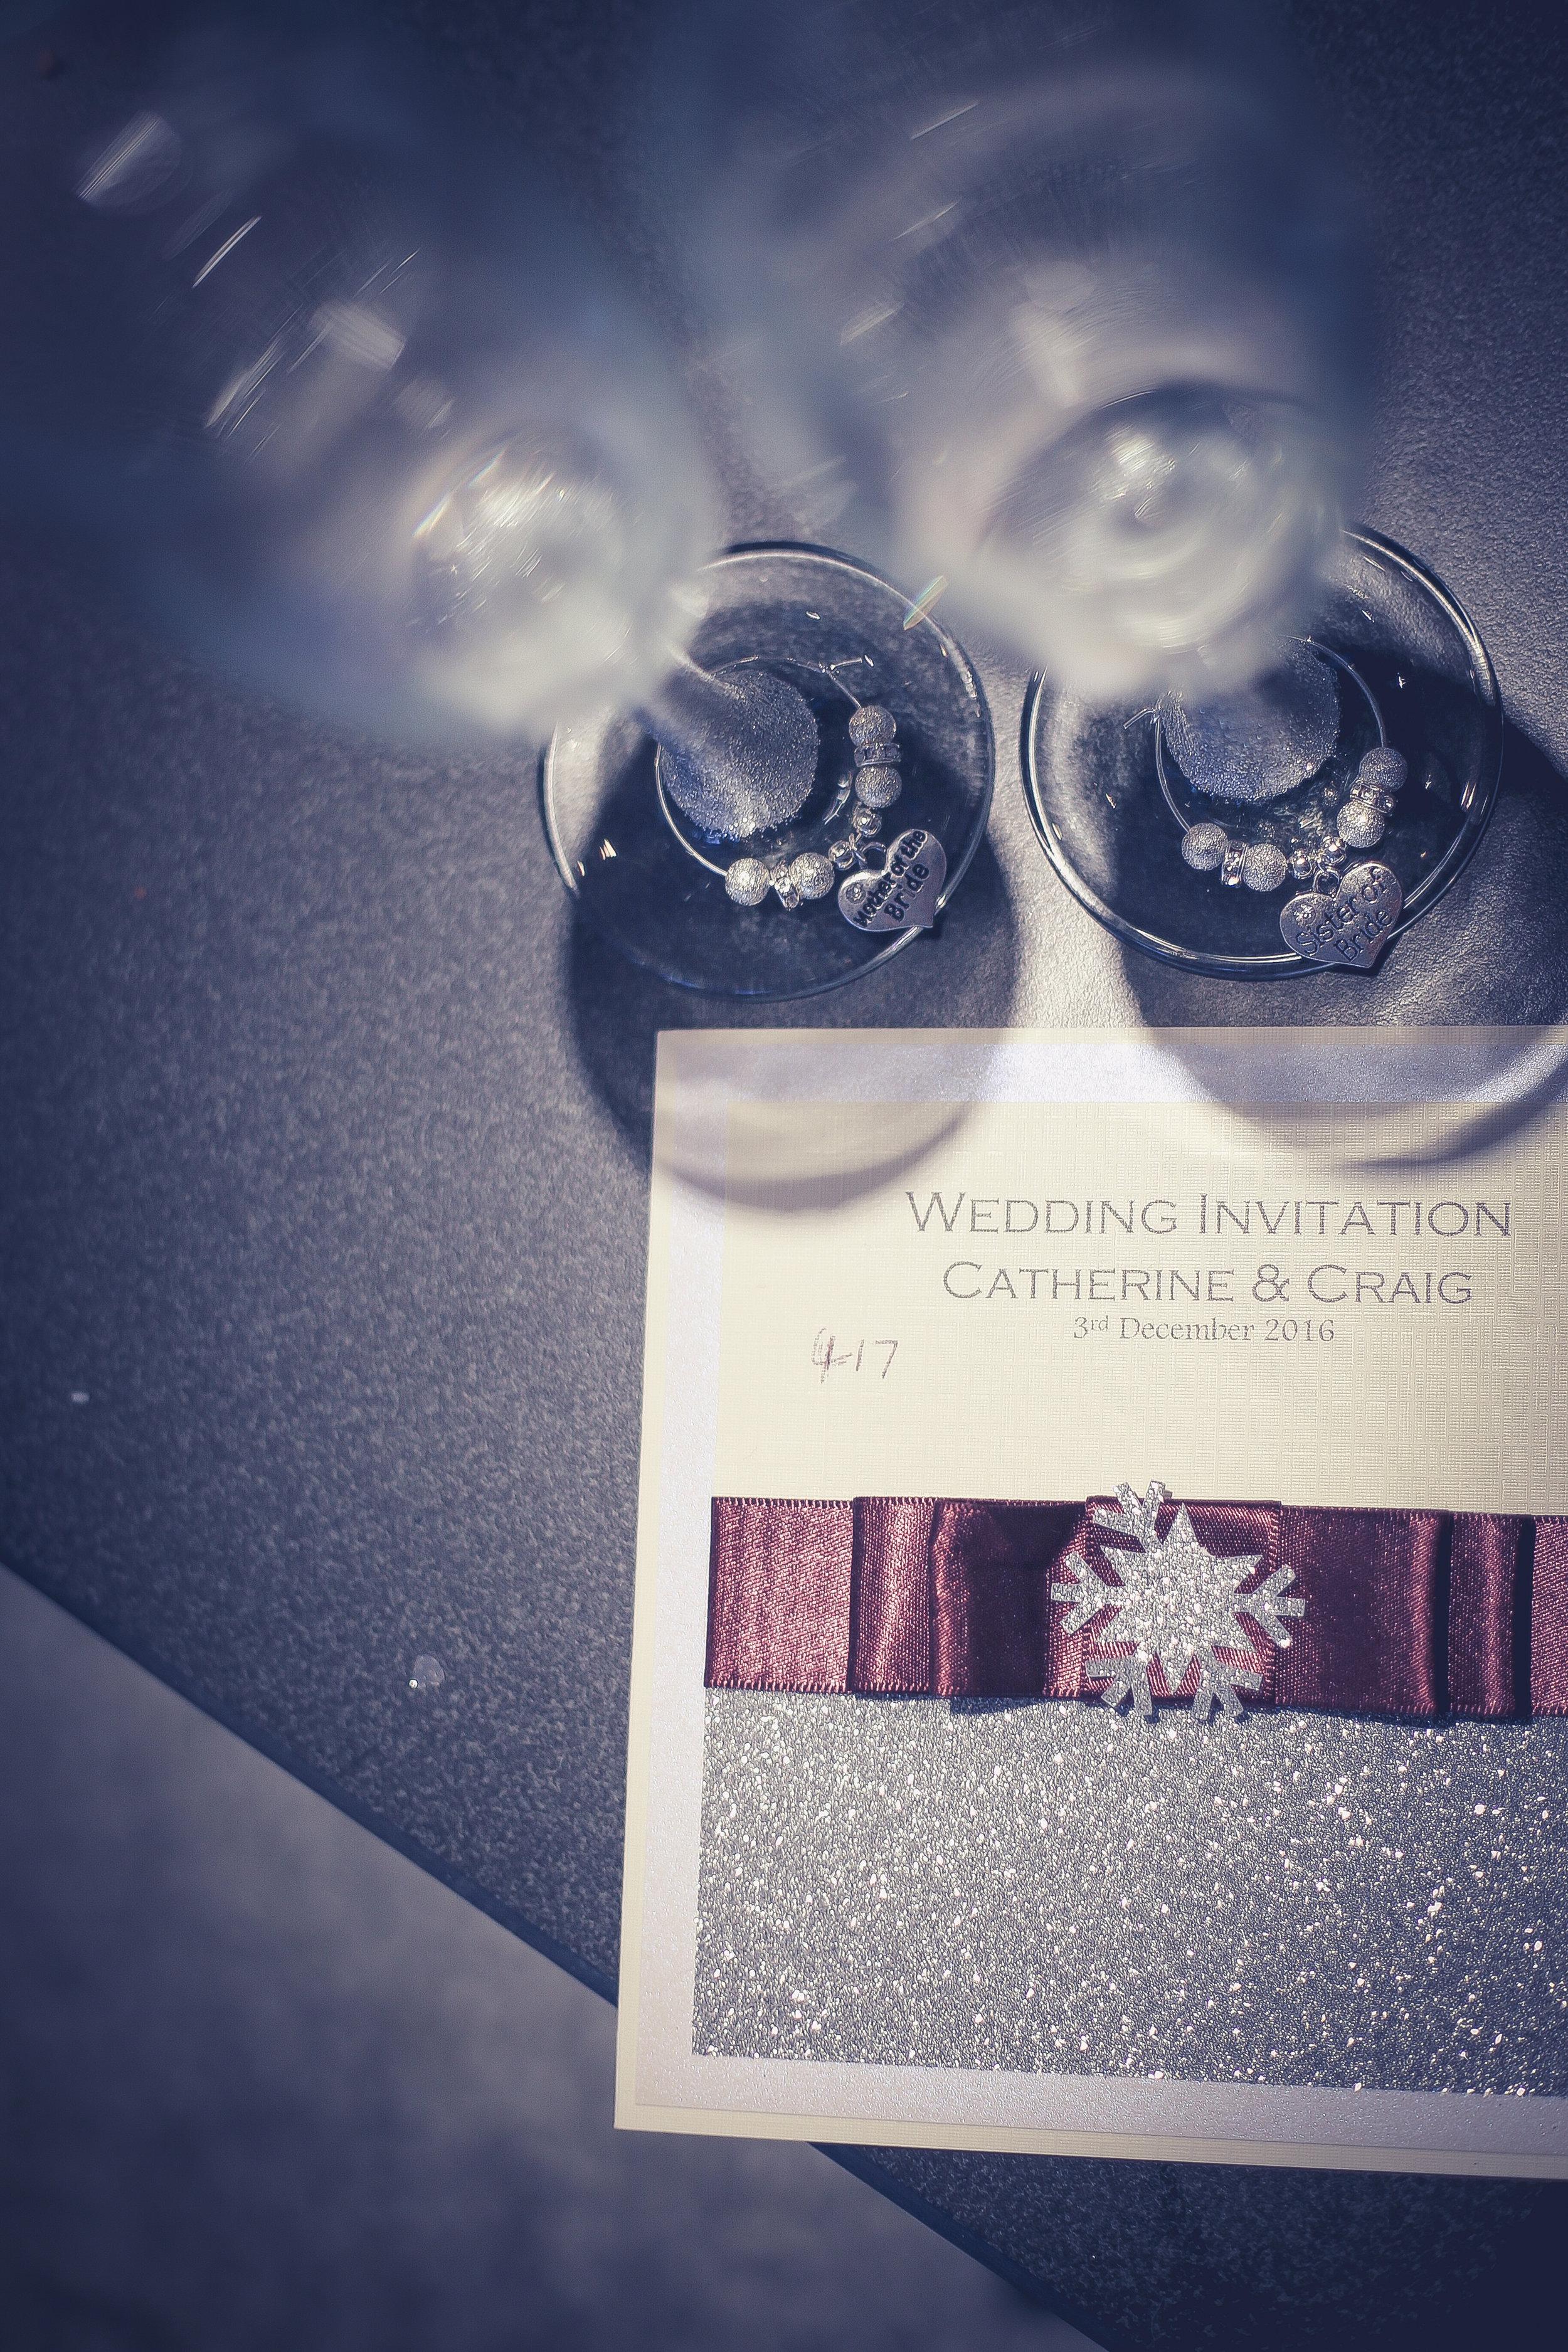 Weddings at the shankley hotel liverpool-1-16.jpg